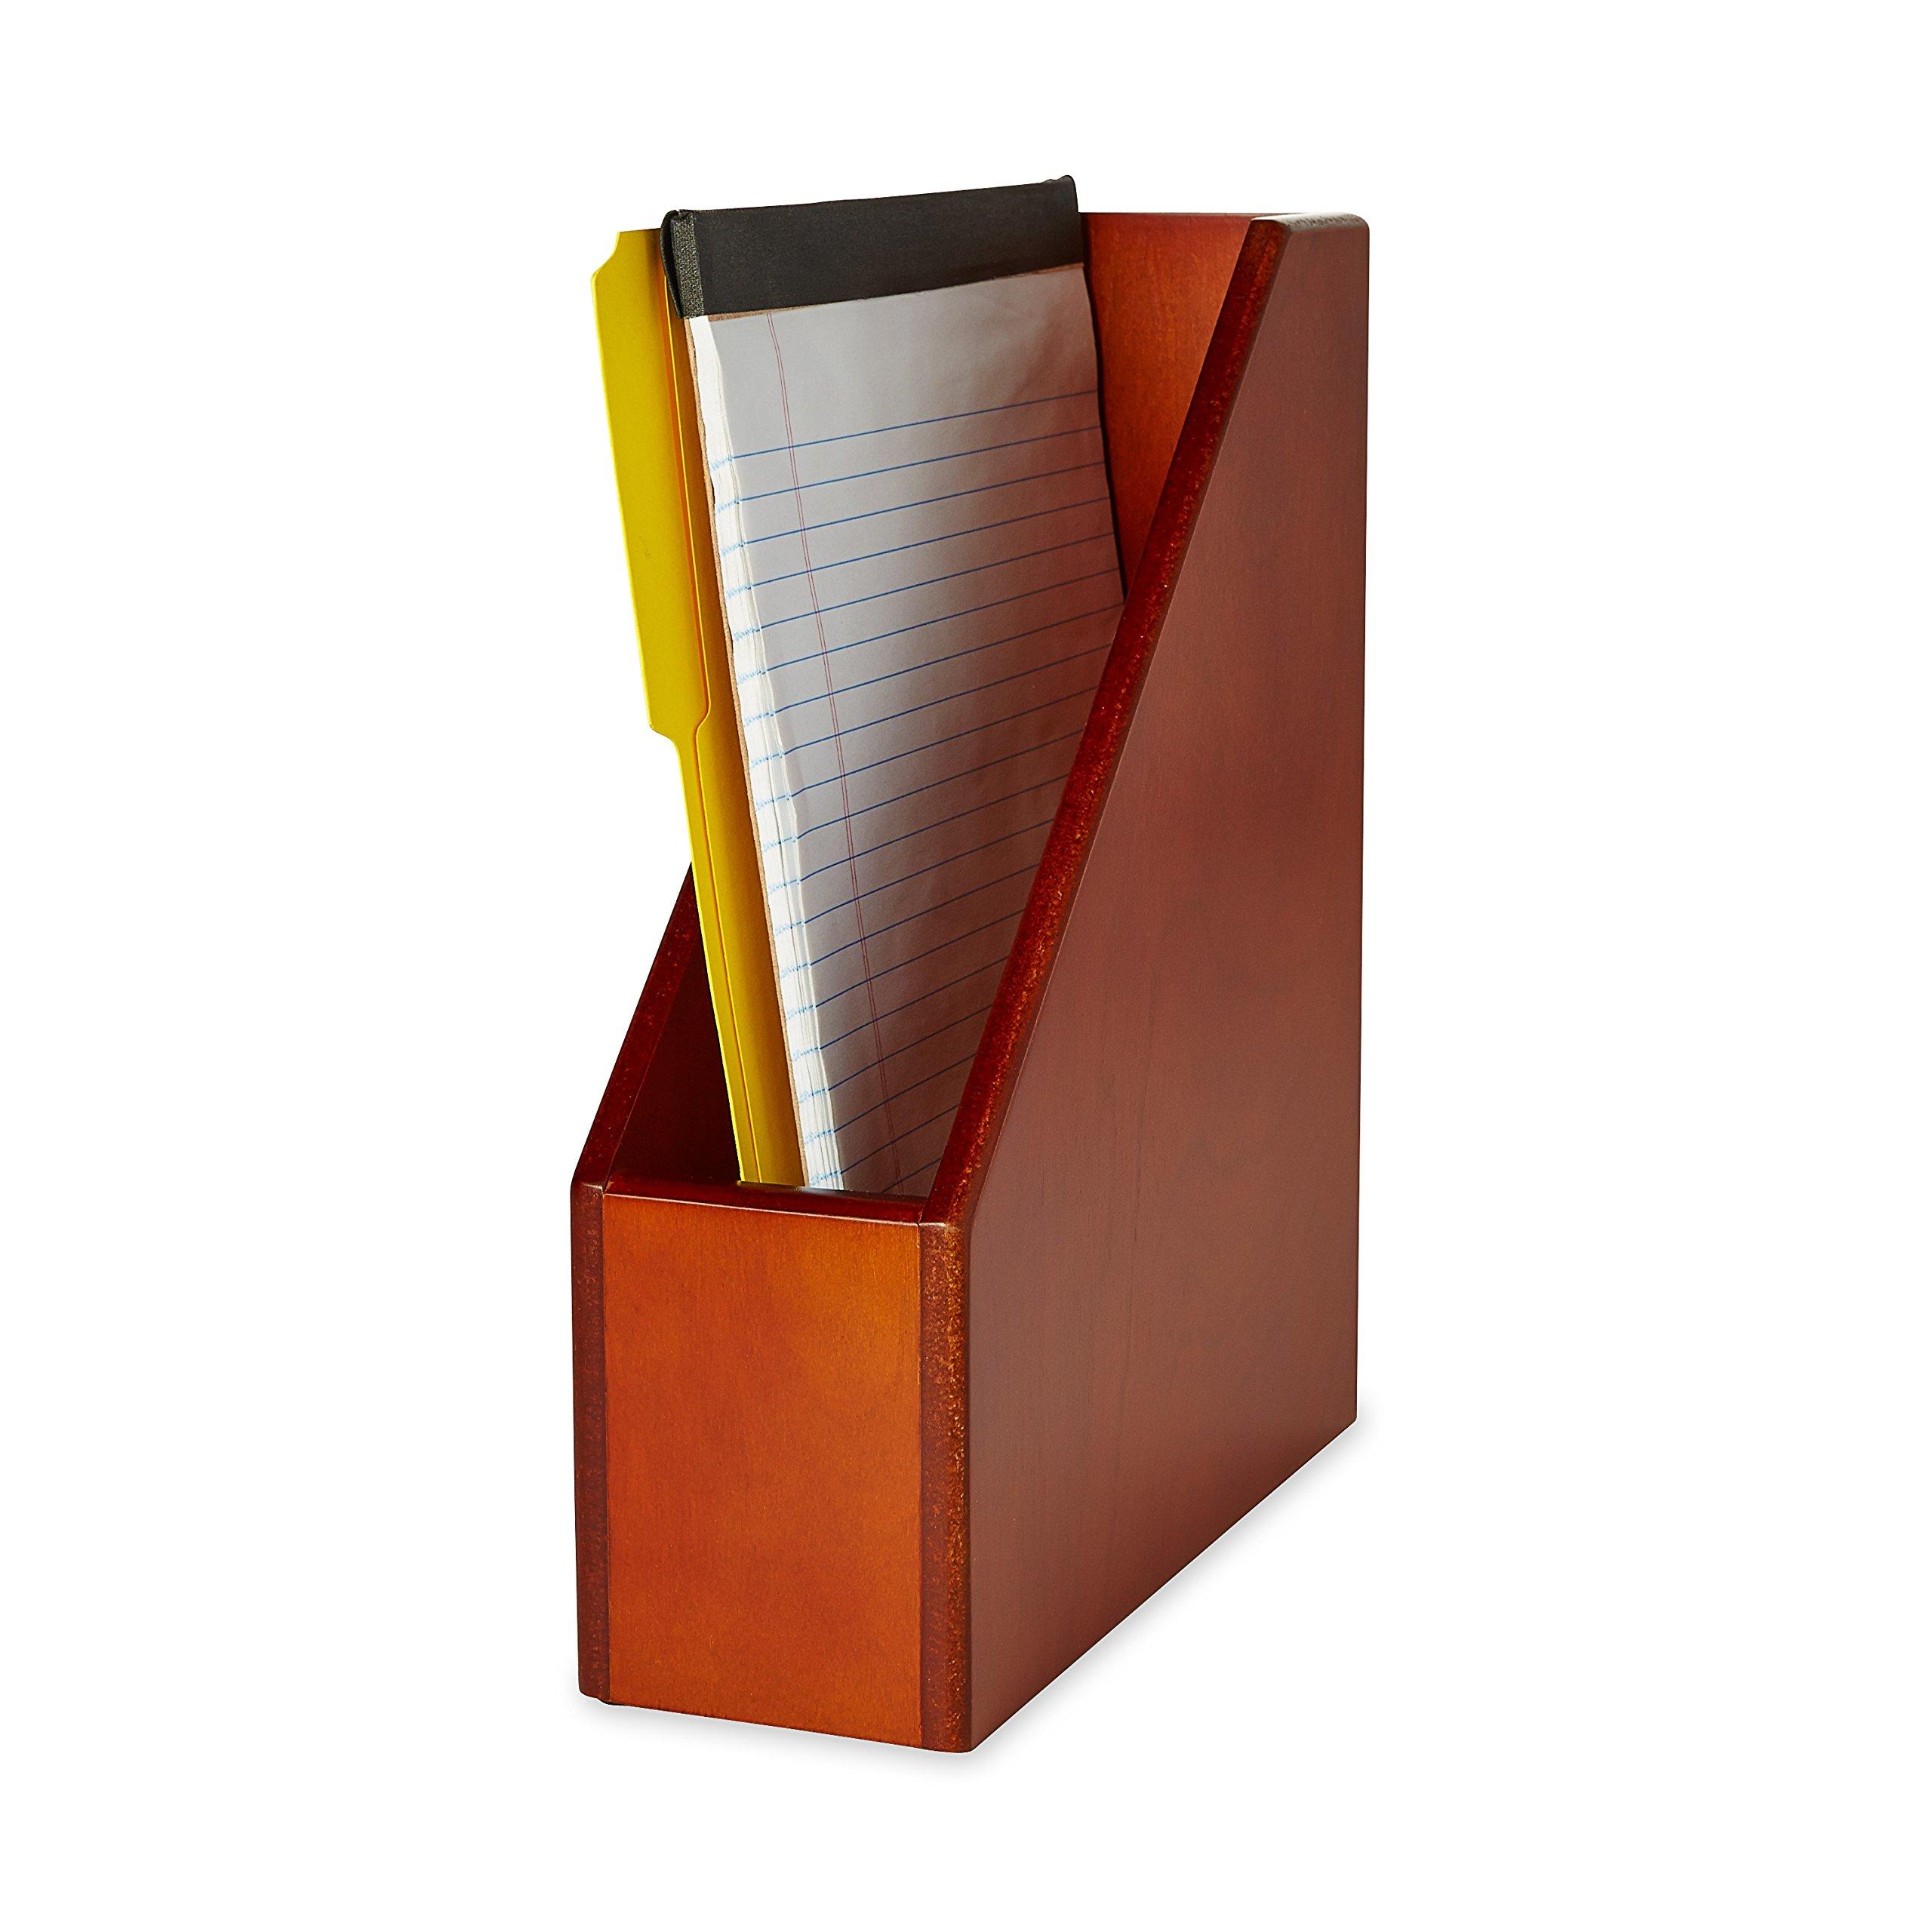 Rolodex Wood Tones Magazine File, 3.5 x 10.25 x 11.75-Inch, Mahogany (4079)